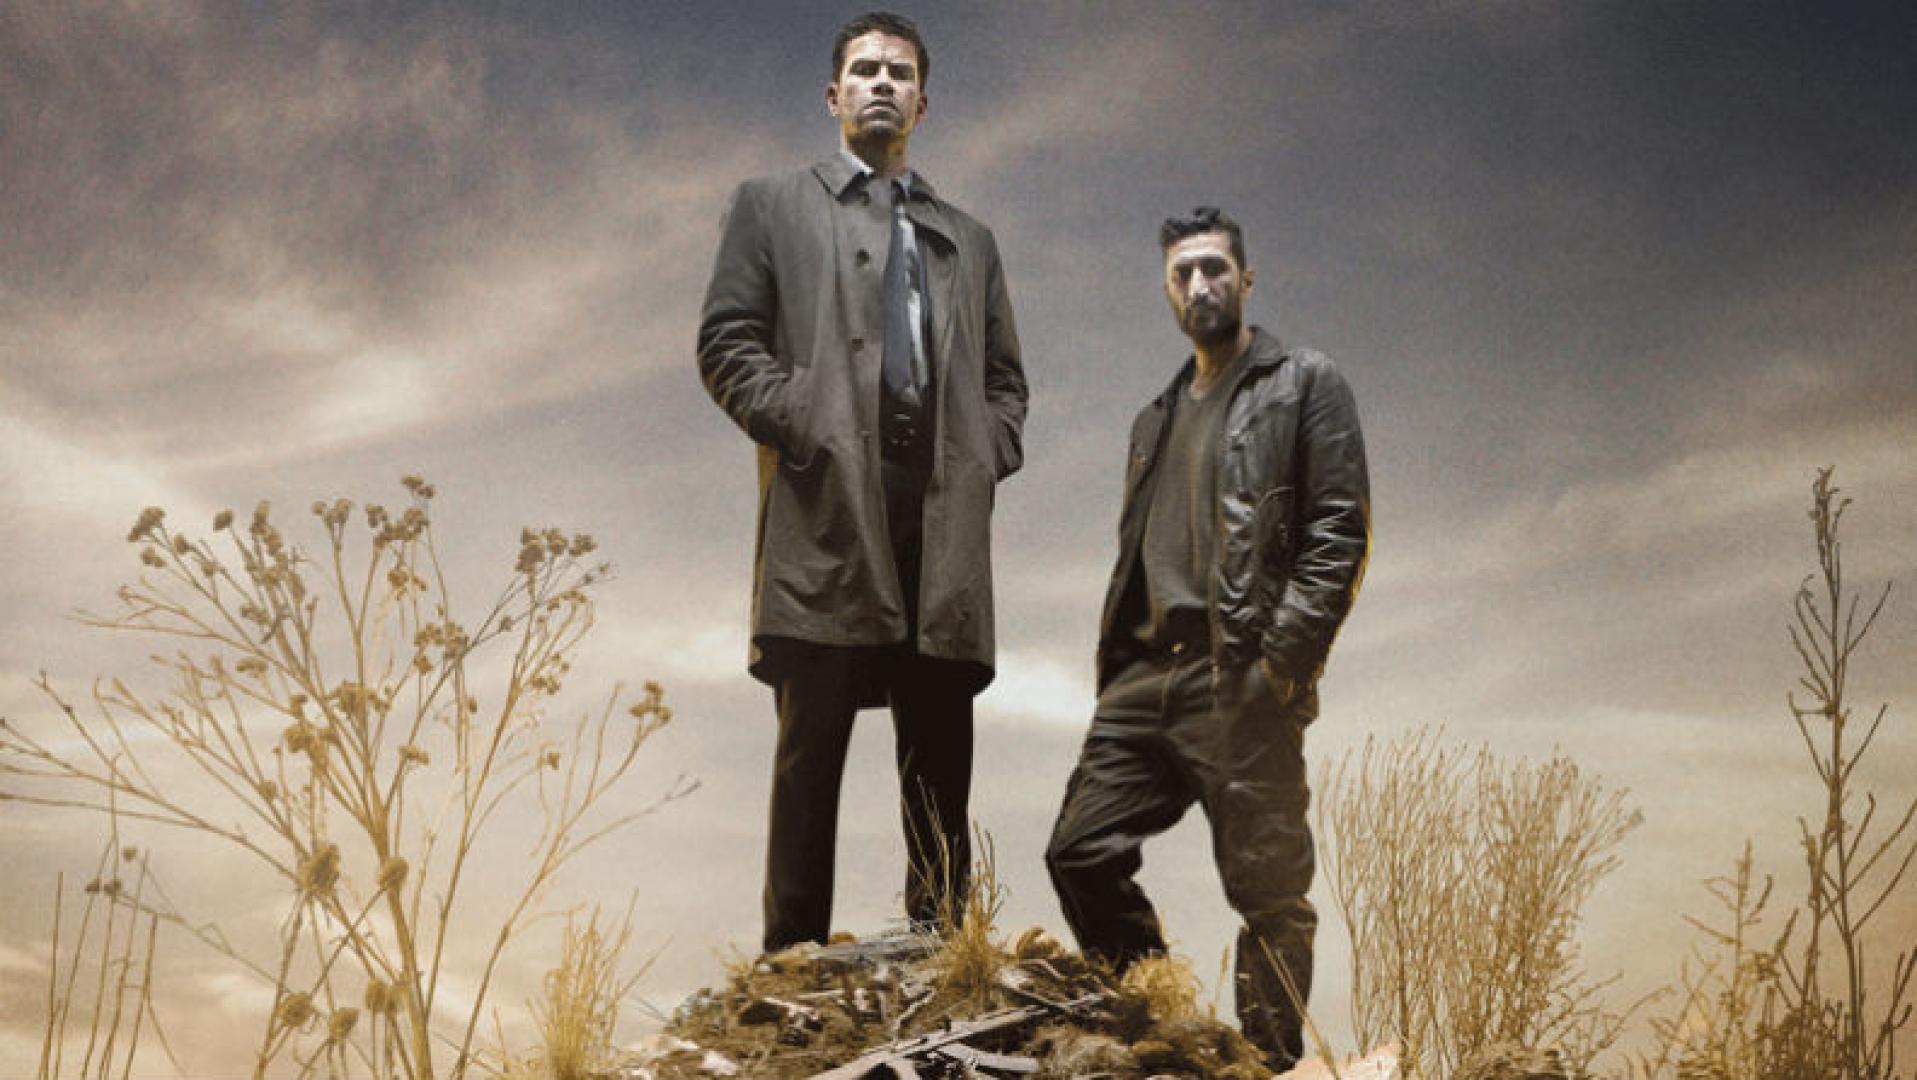 Fasandræberne / Fácángyilkosok (2014)